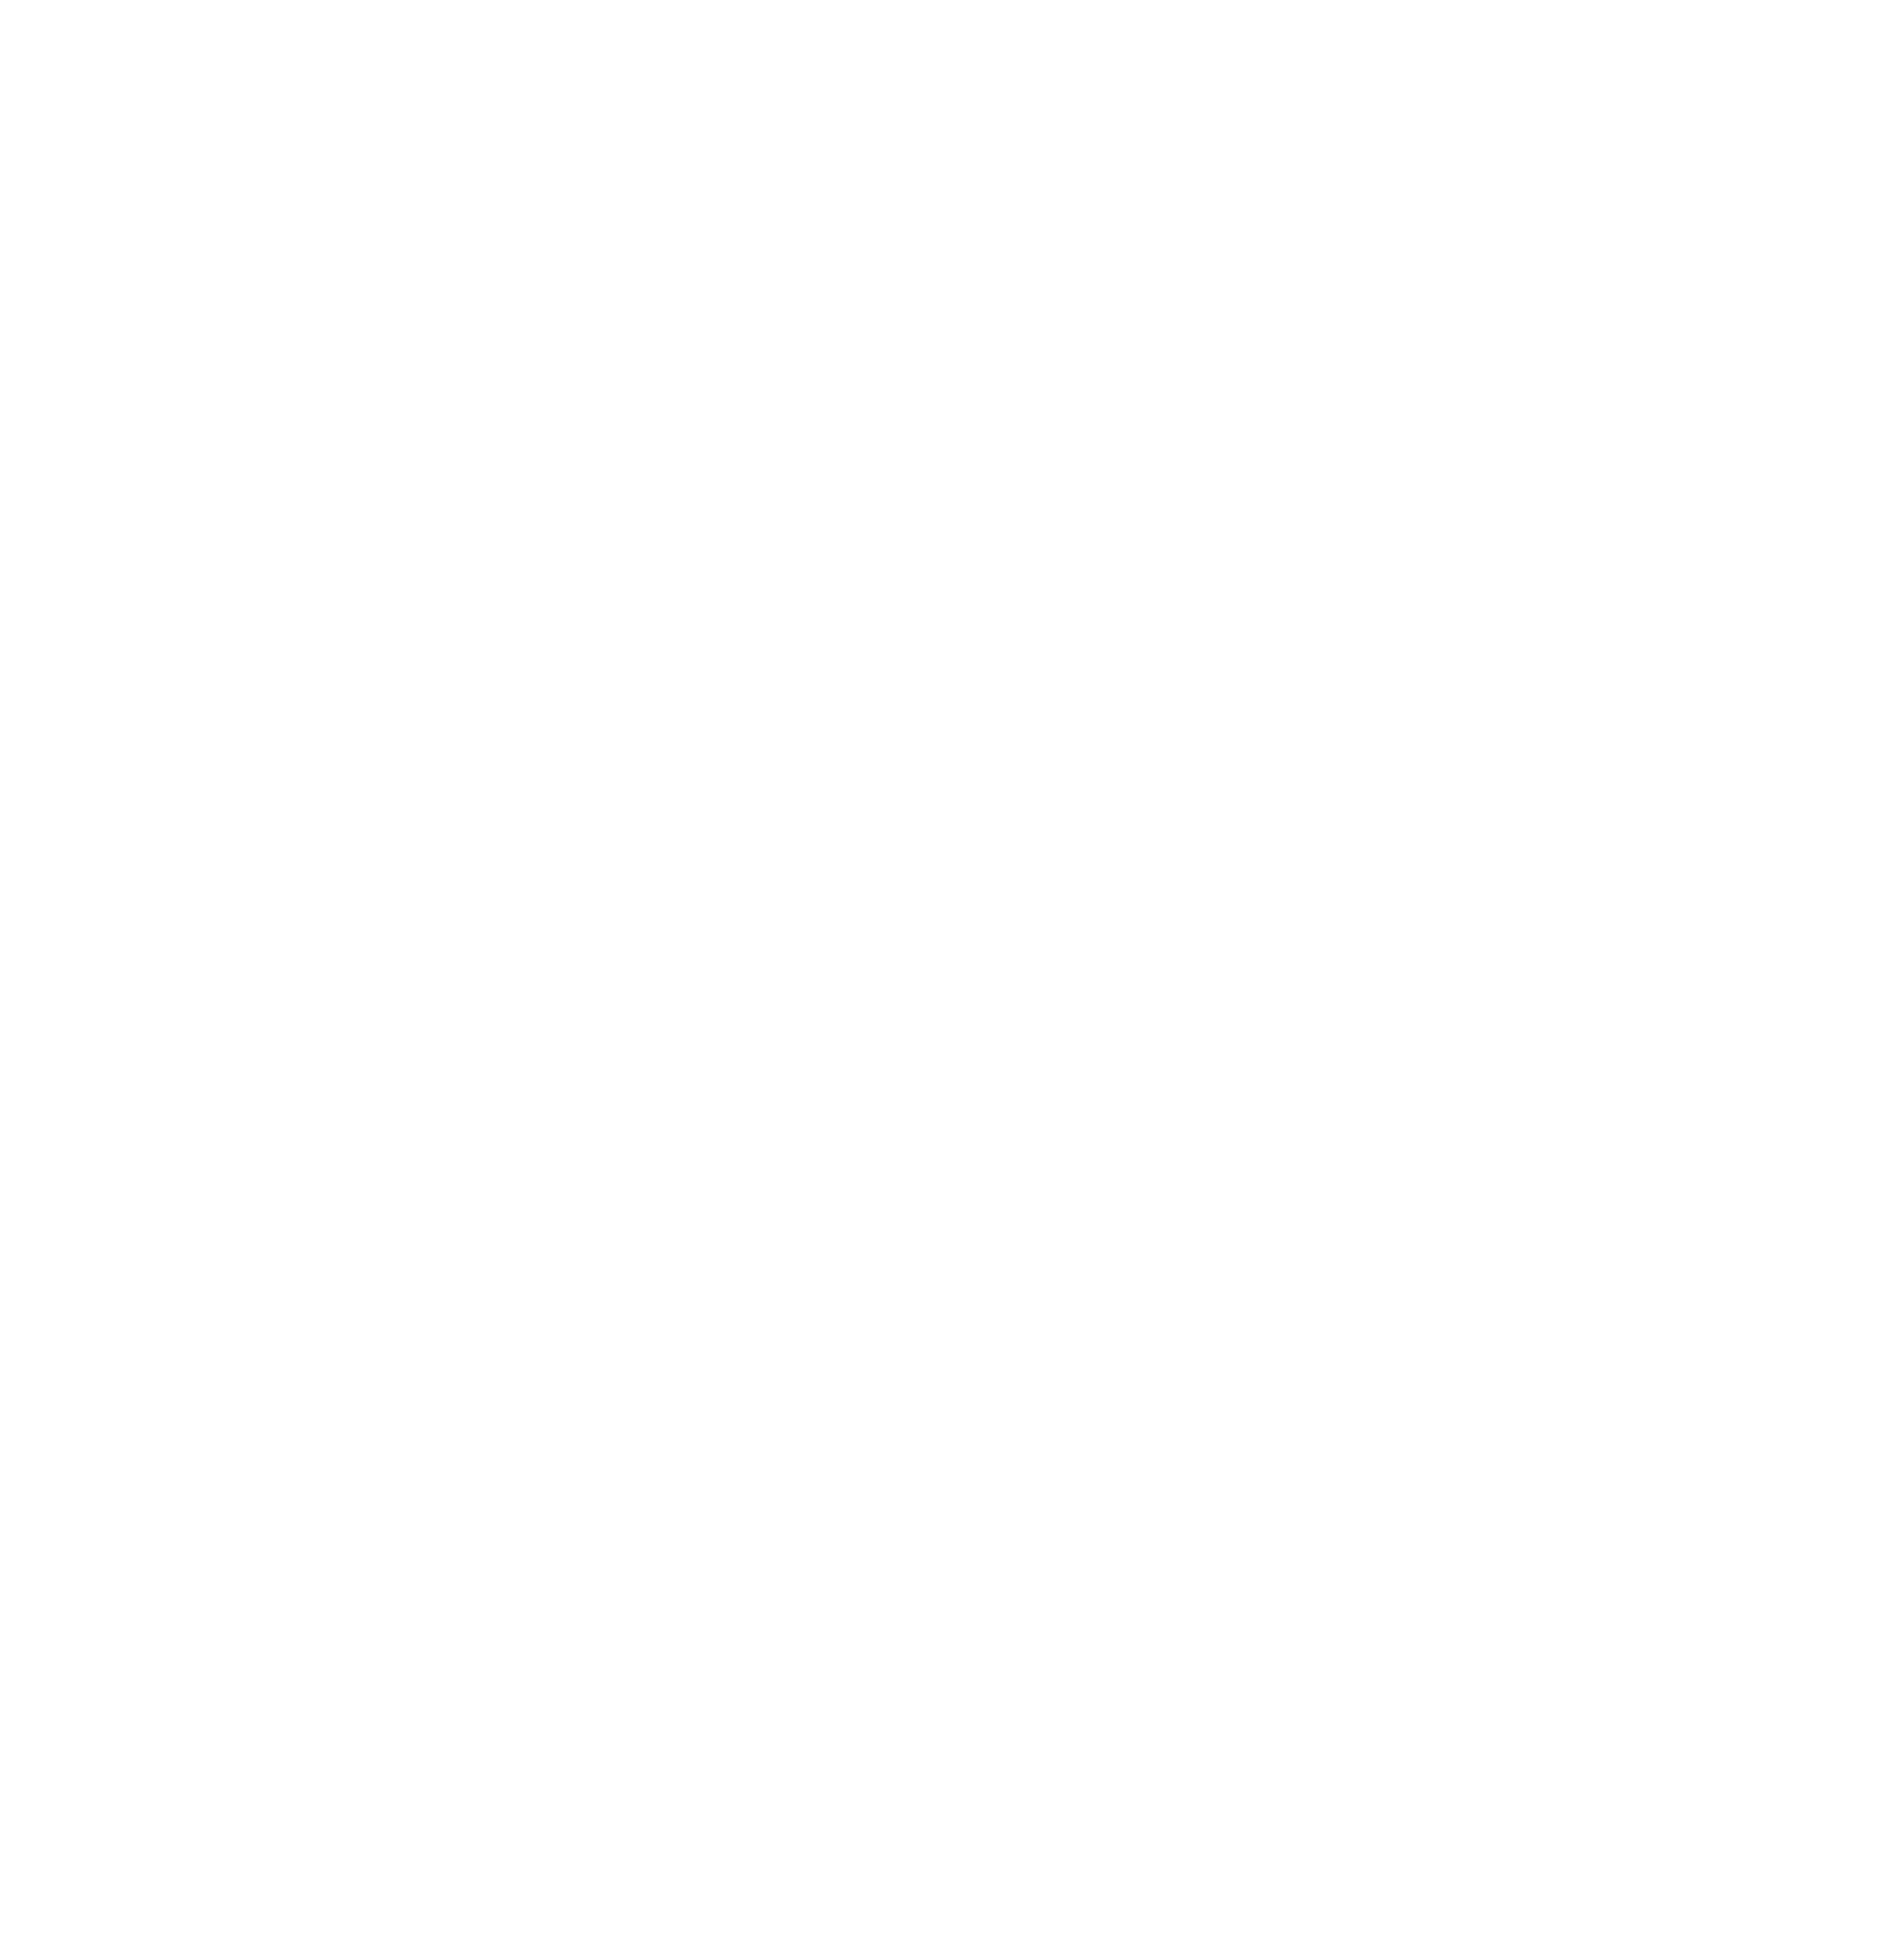 Guild of Enchaunti